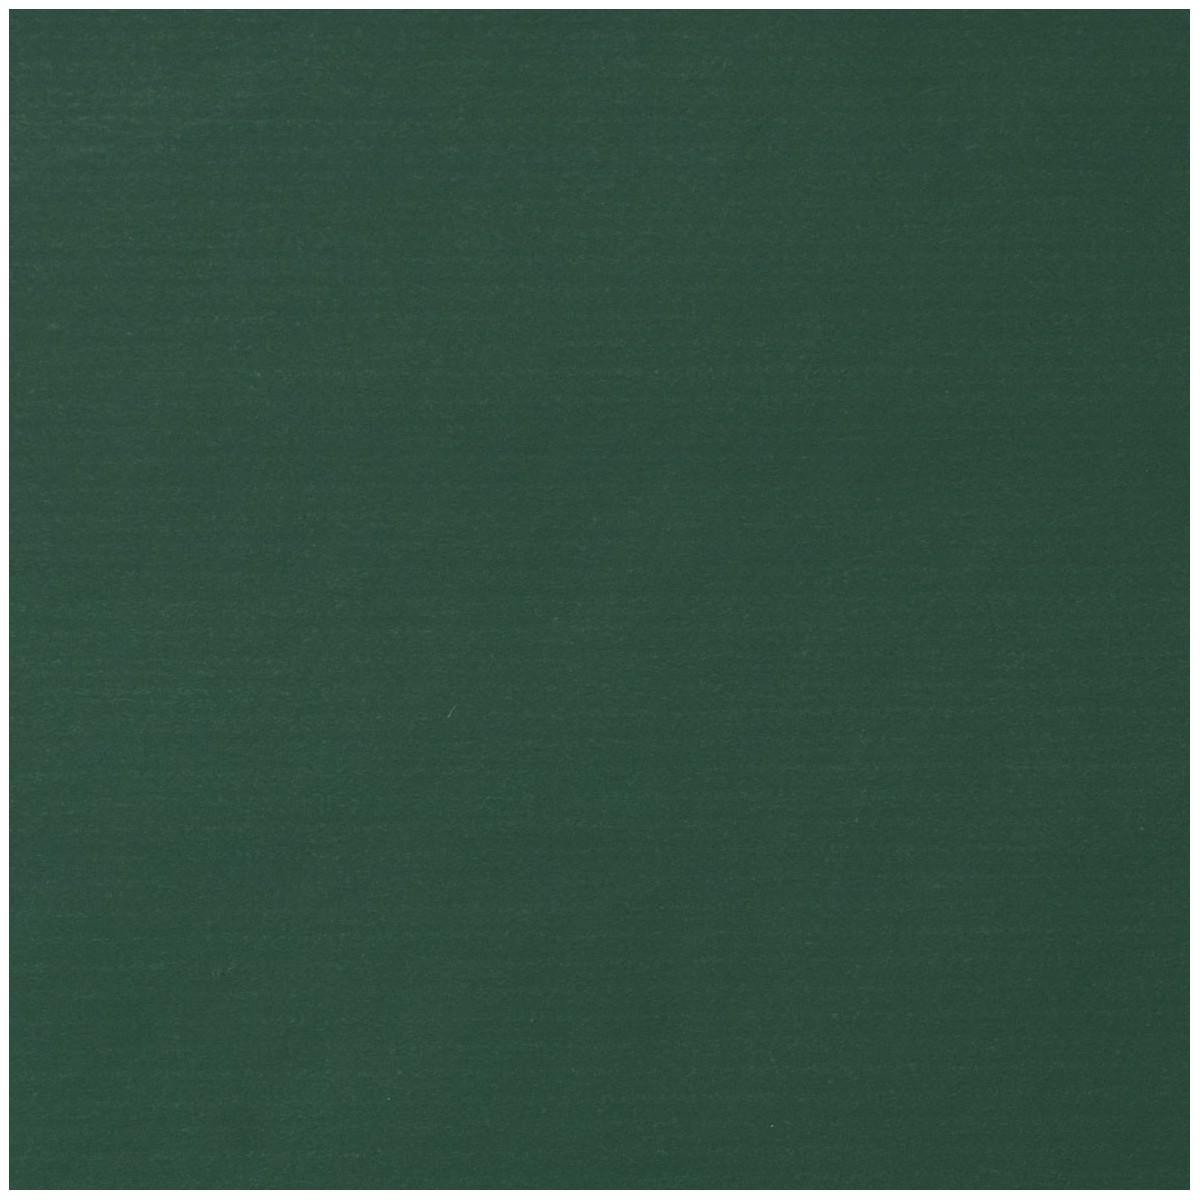 Carta Sealing Avana ECOBROWN Gr.60 Fogli Cm.70x100 Colori Tinta Unita (al Kg.) Verde Scuro